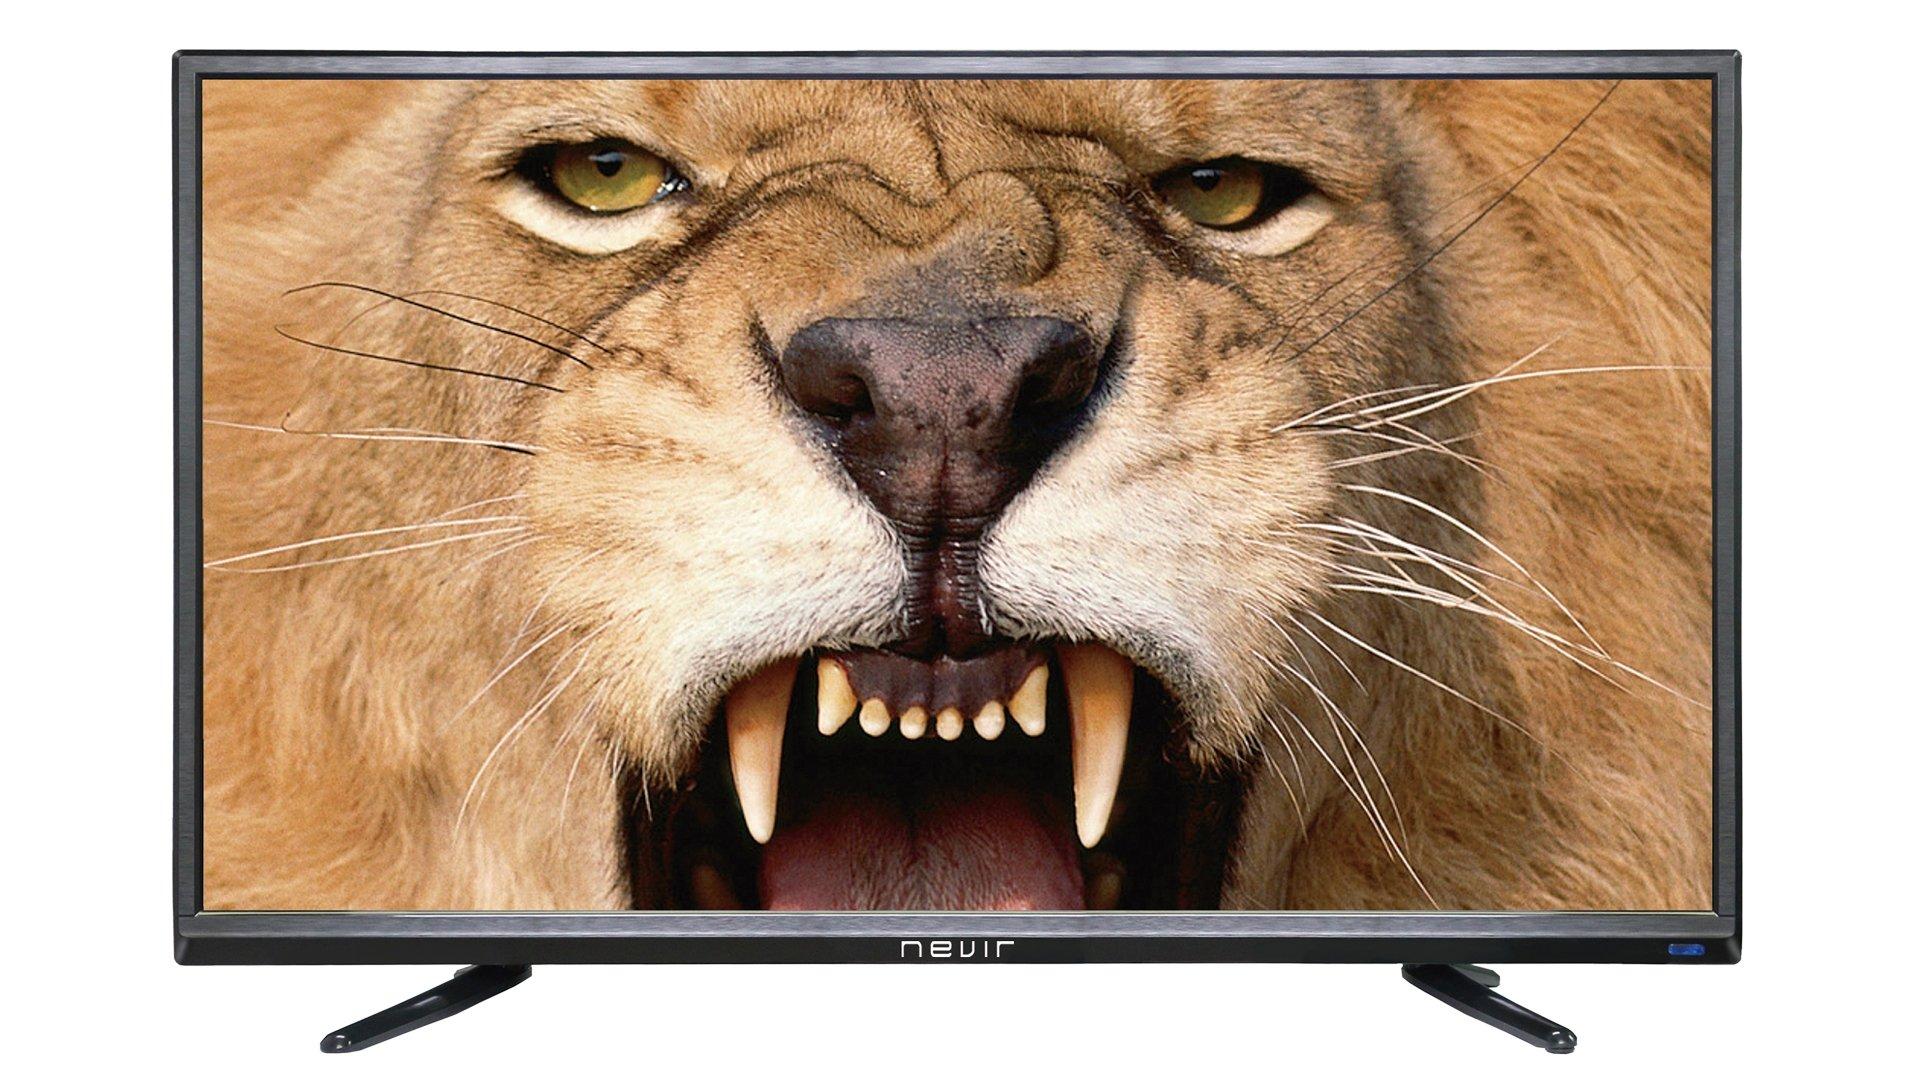 TELEVISOR DLED NEVIR NVR-7419-40HD-N: Amazon.es: Electrónica